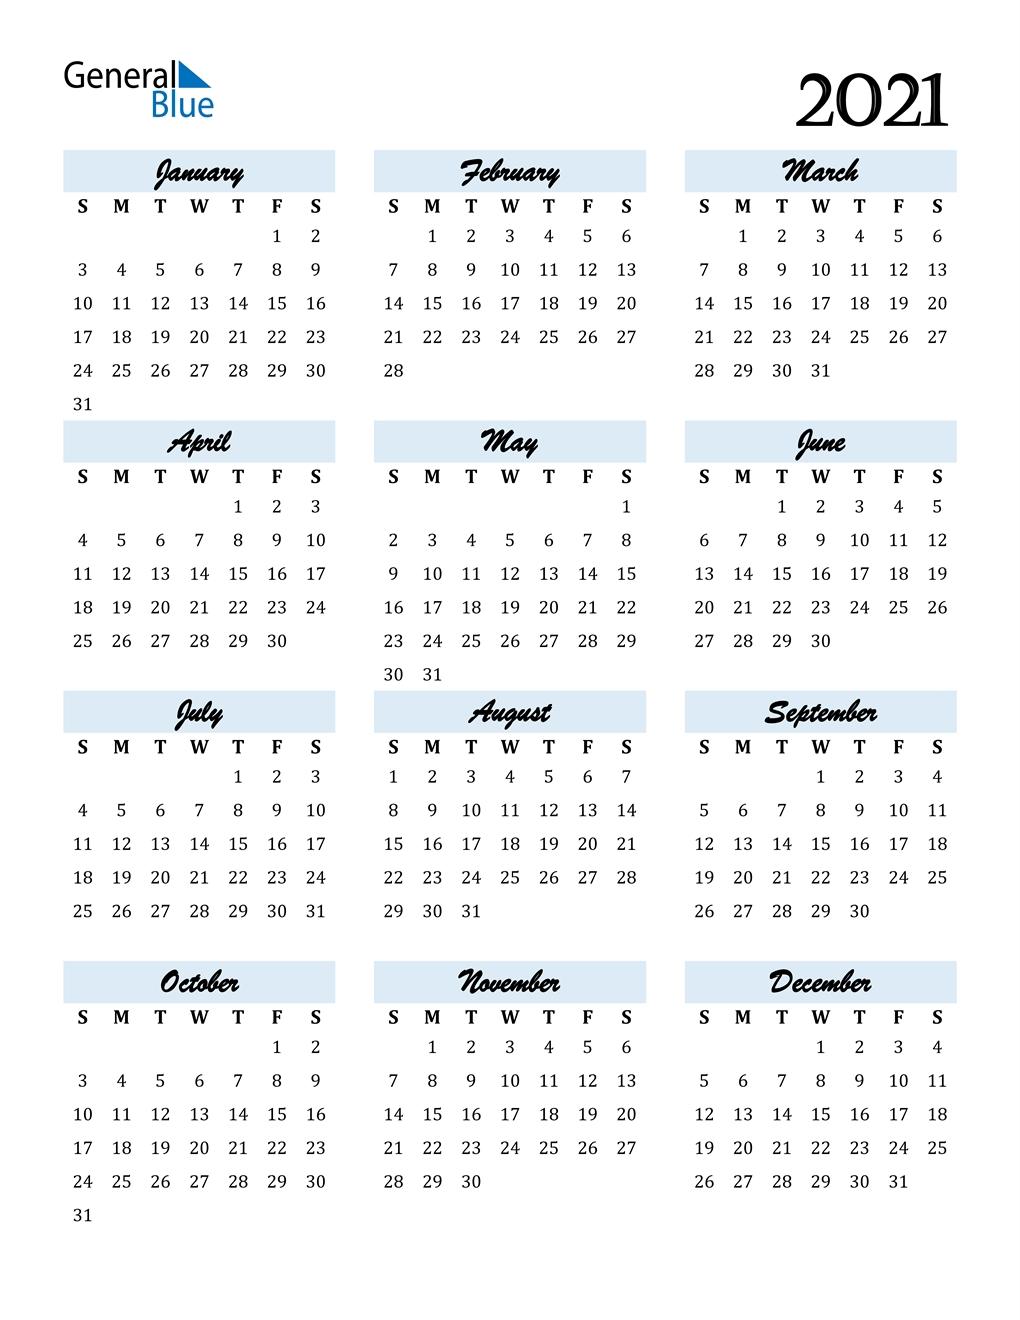 Calendar 2022 Malaysia Kuda - Nexta intended for Calendar Kuda 2021 Download Photo